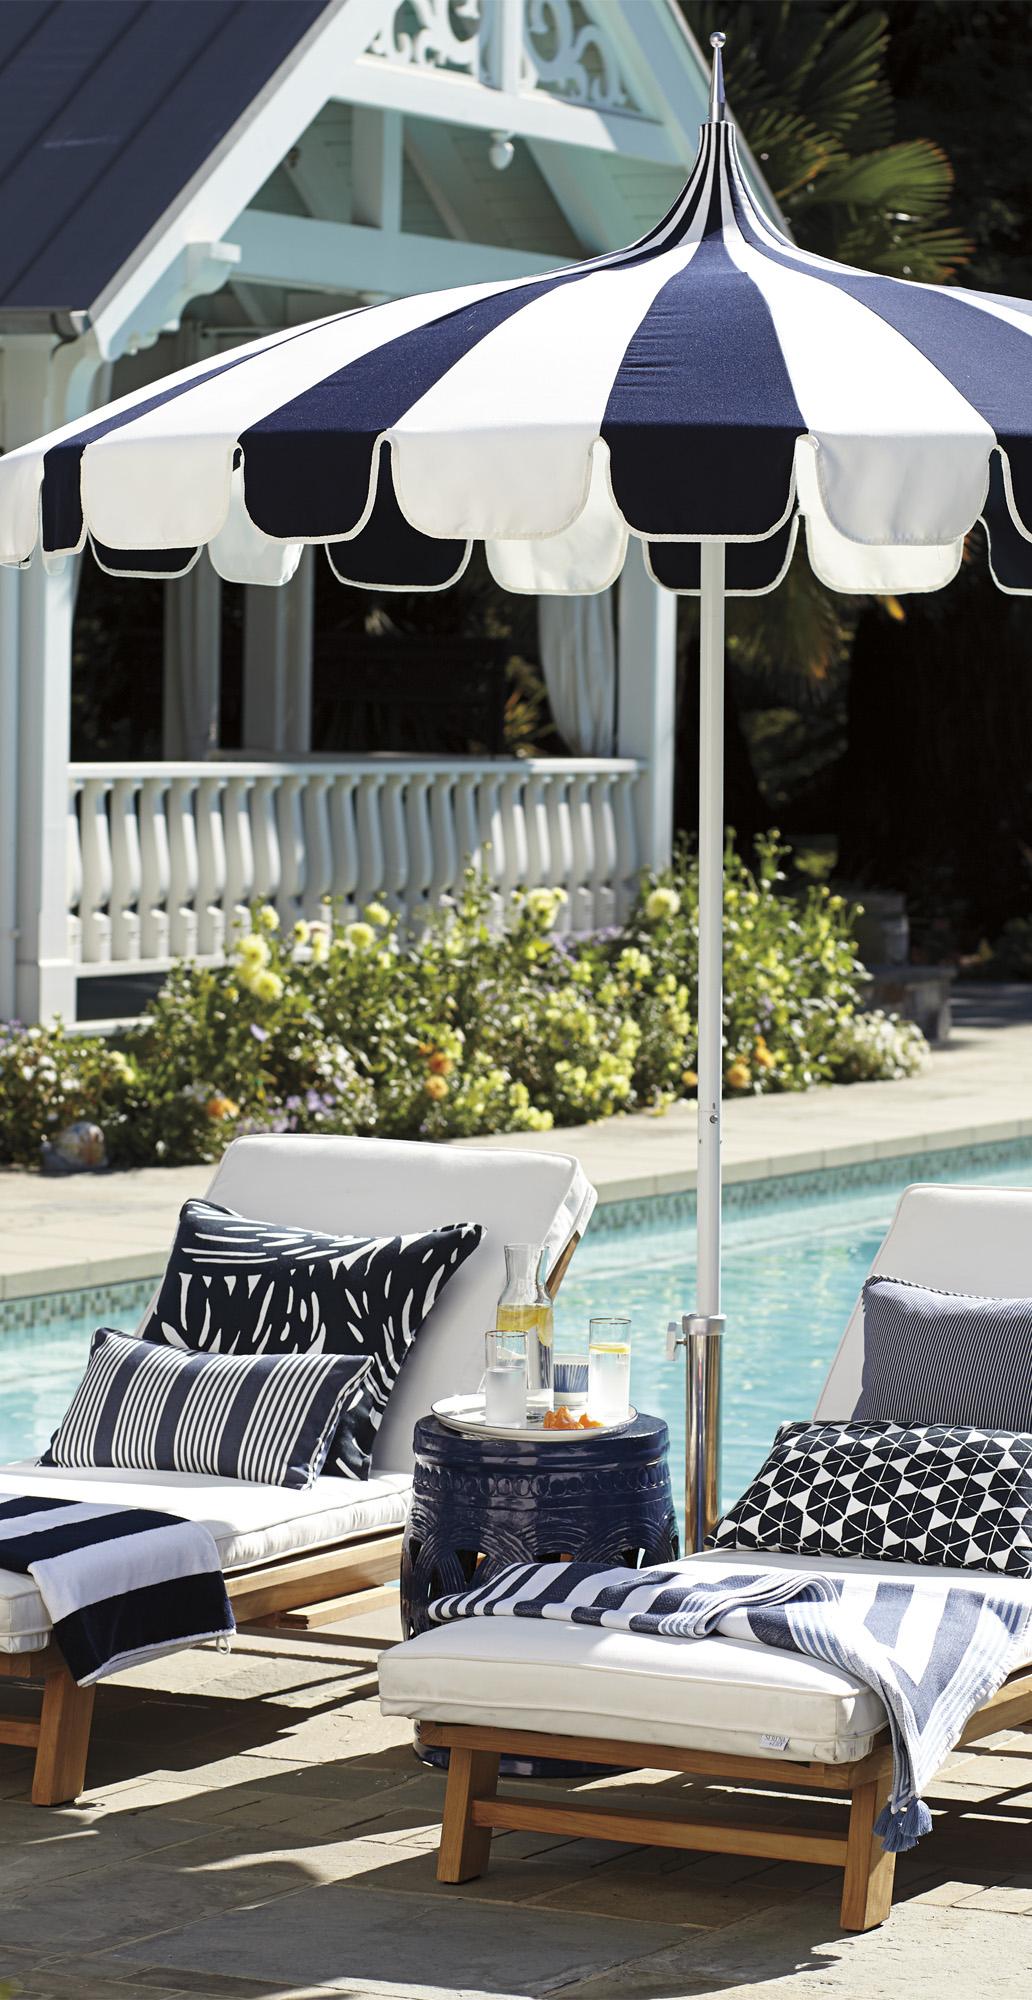 Pool Lounge Chair Ideas